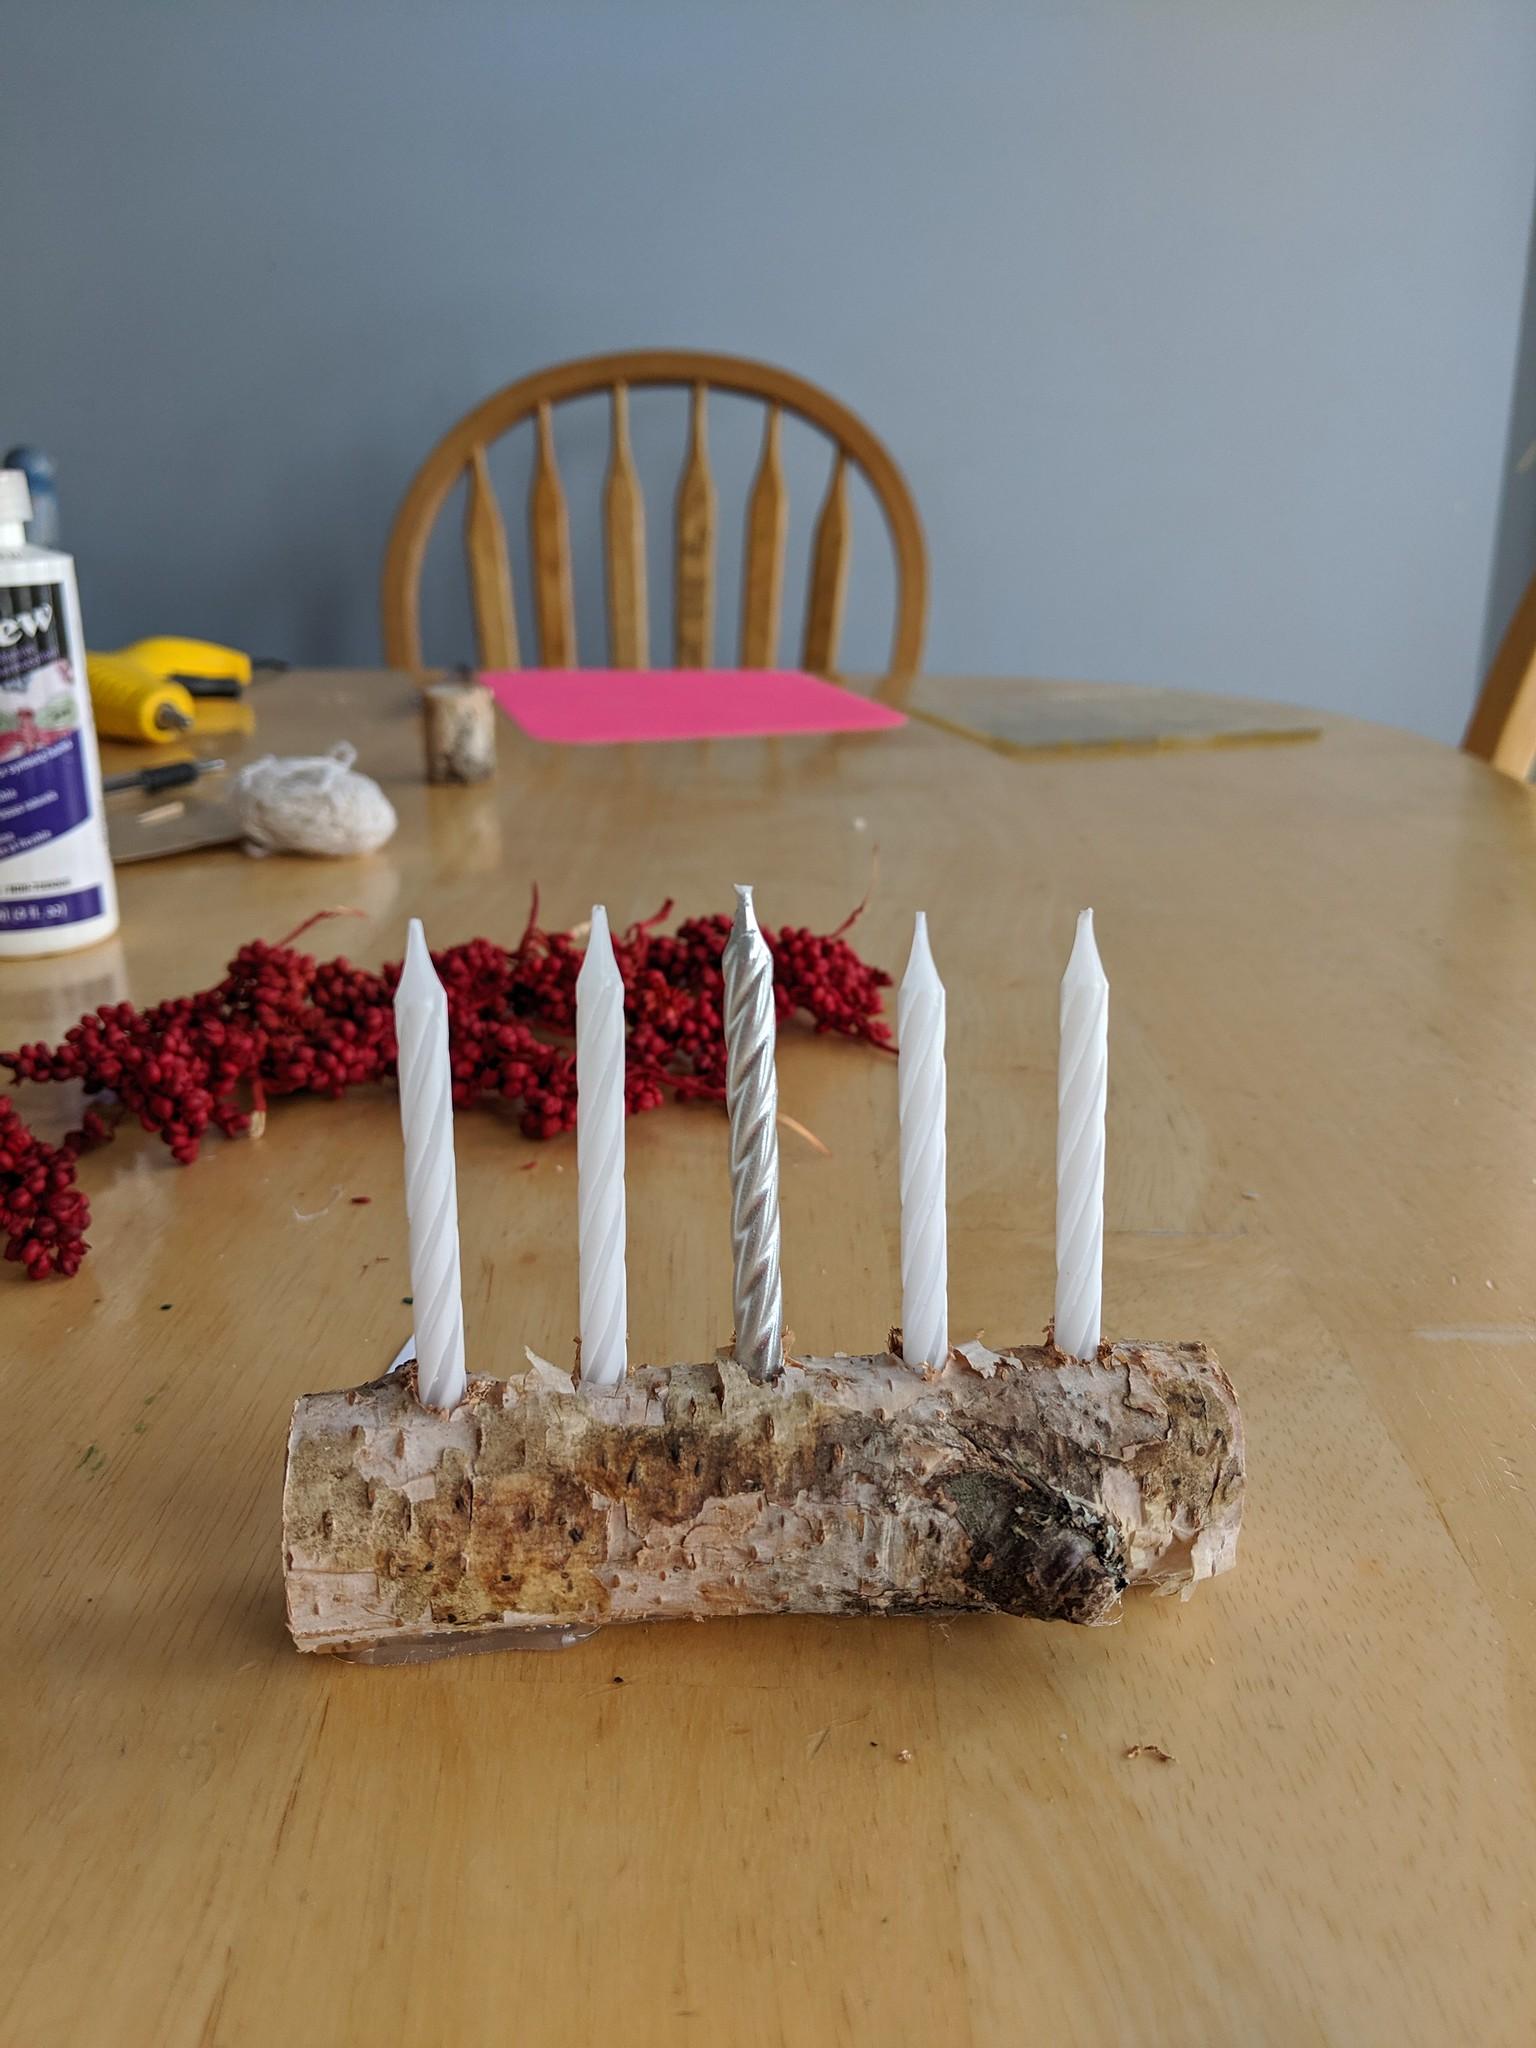 Onebluestocking An Advent Wreath Er Log